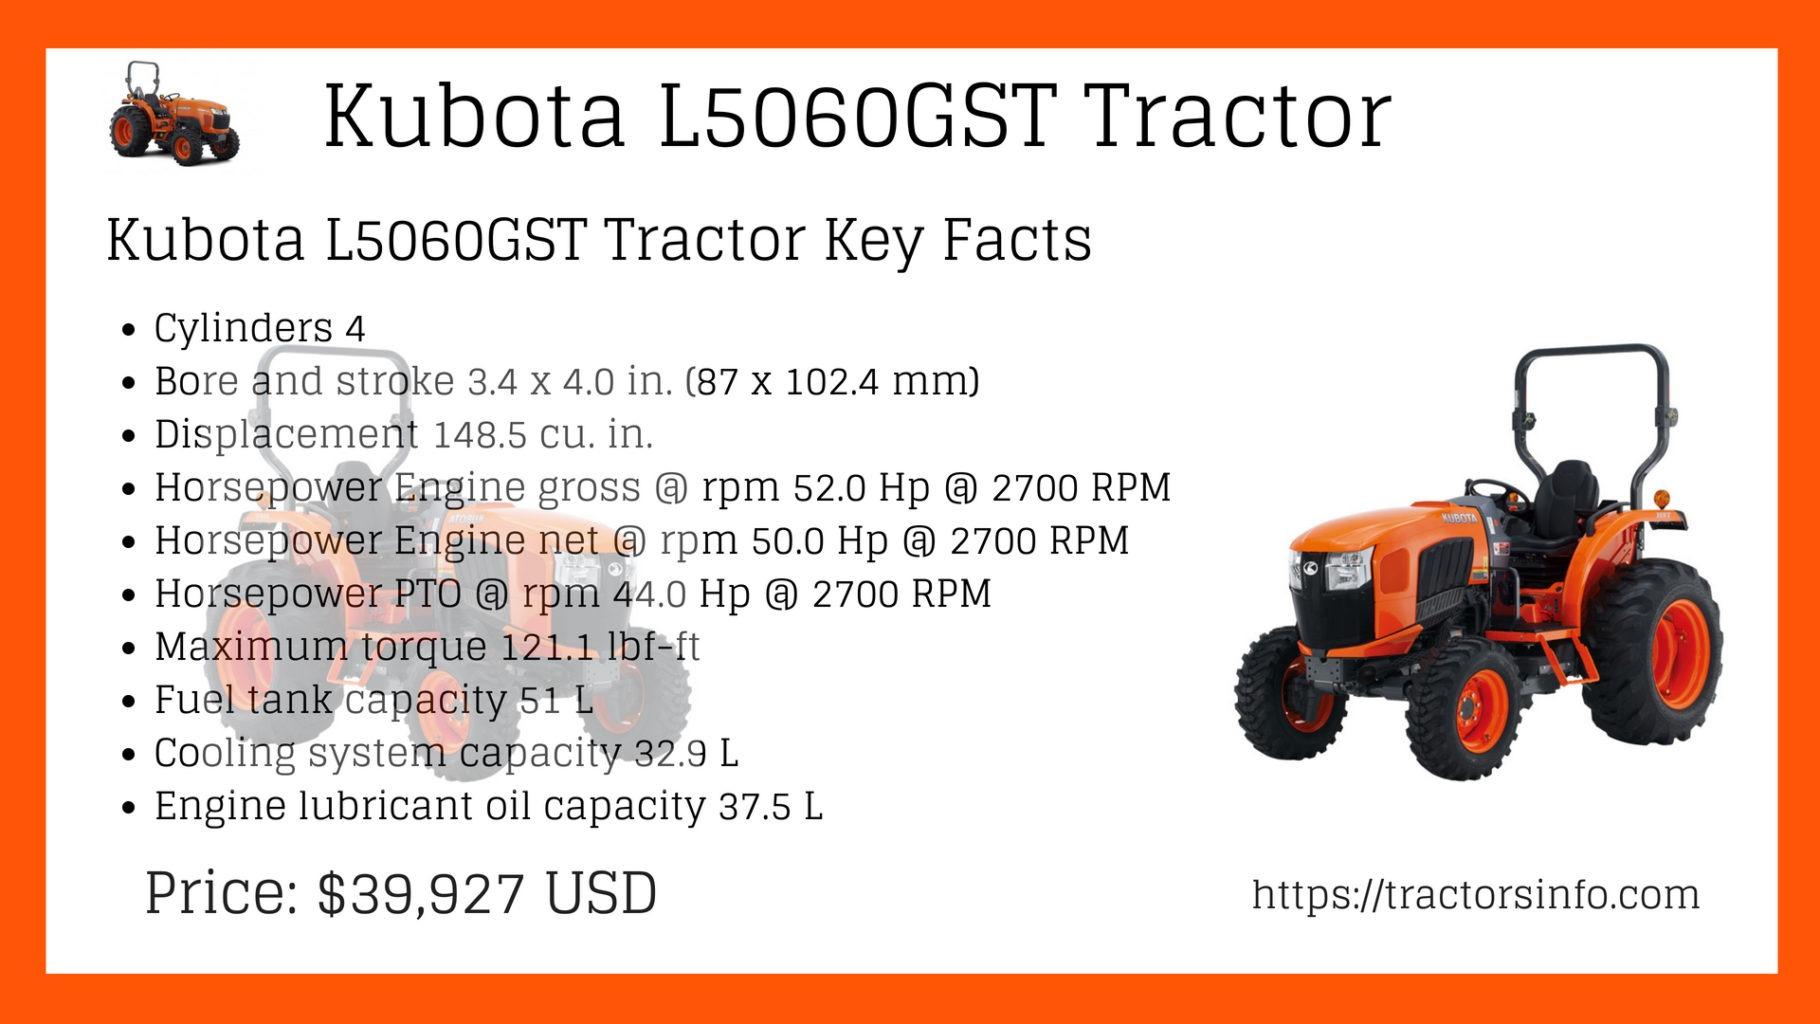 Kubota L5060GST Tractor